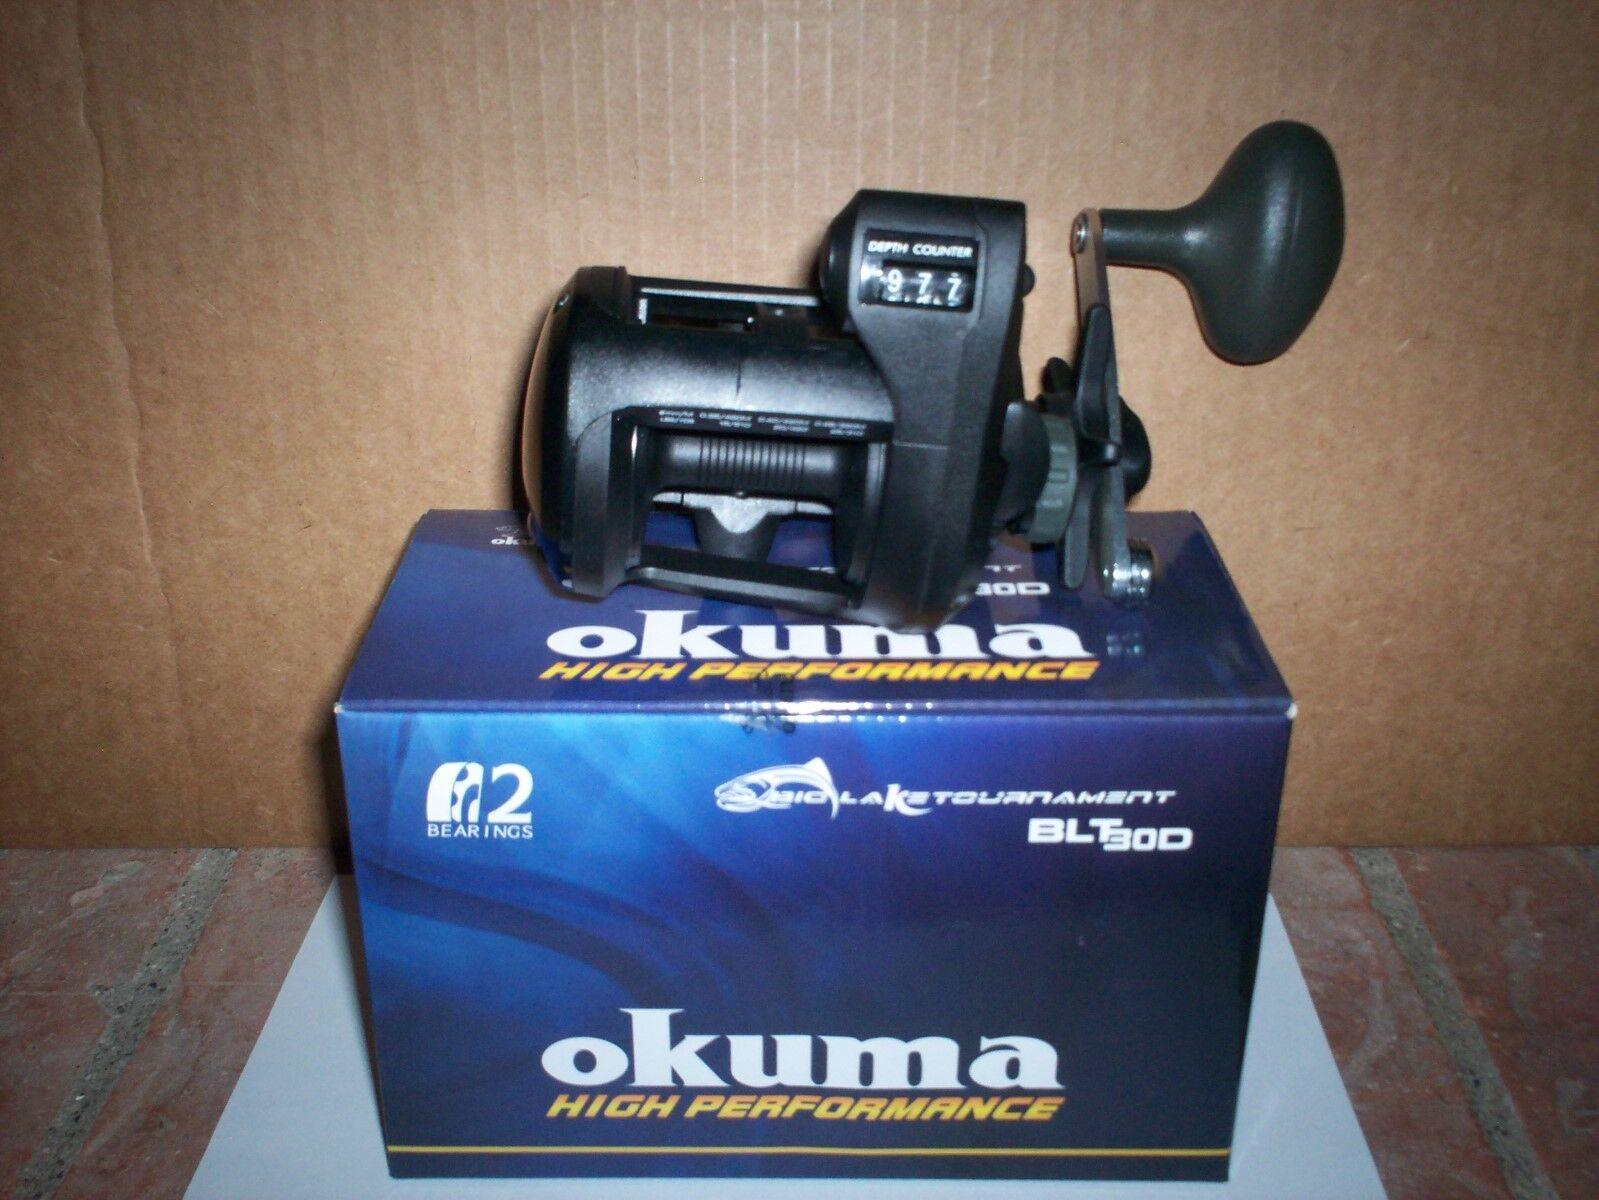 OKUMA BLT30D  TROLLING LINE COUNTER  REEL NEW IN THE BOX